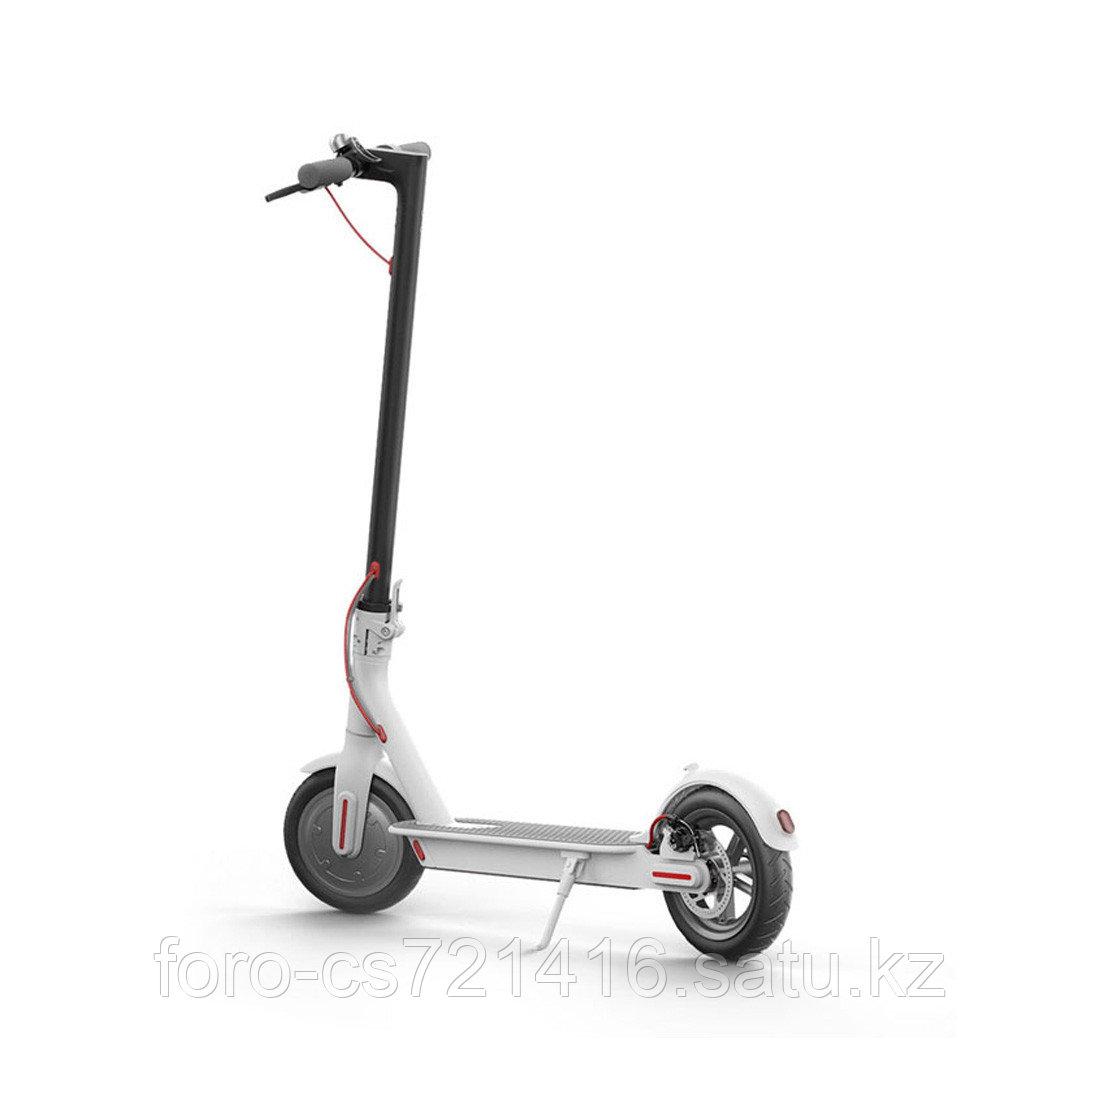 Электросамокат Xiaomi MiJia Smart Electric Scooter (M365) Белый - фото 1